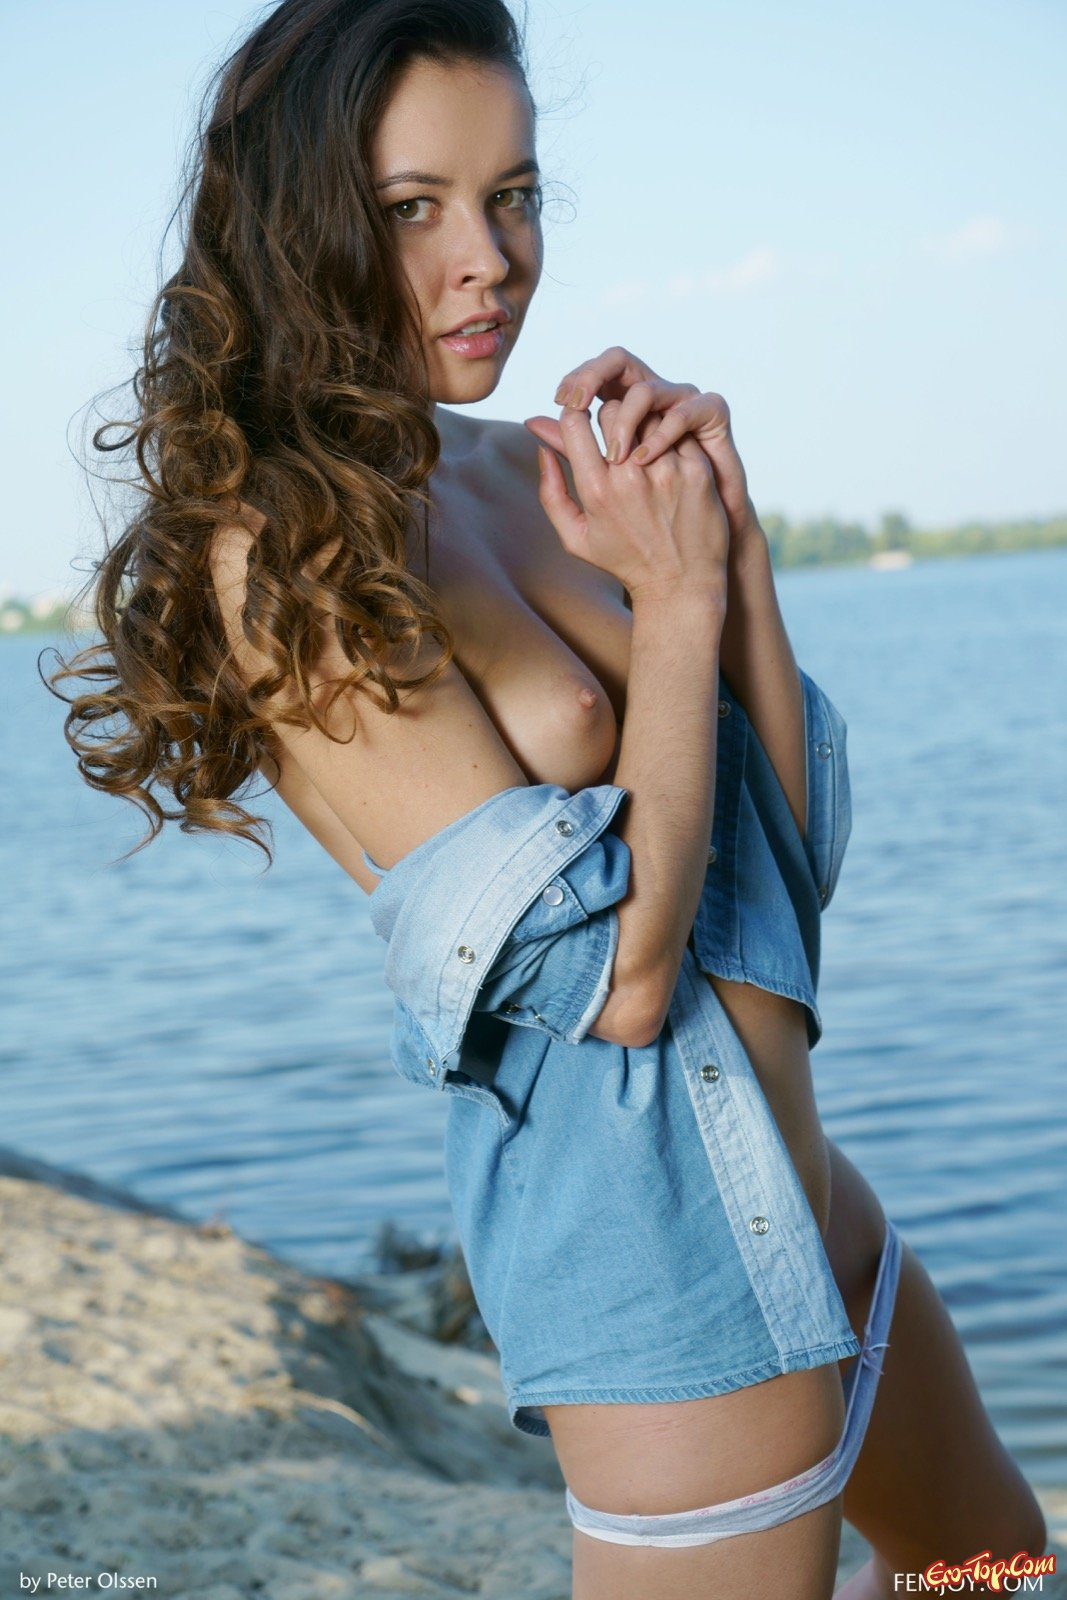 Девушка в рубашке снимает трусики на берегу речки